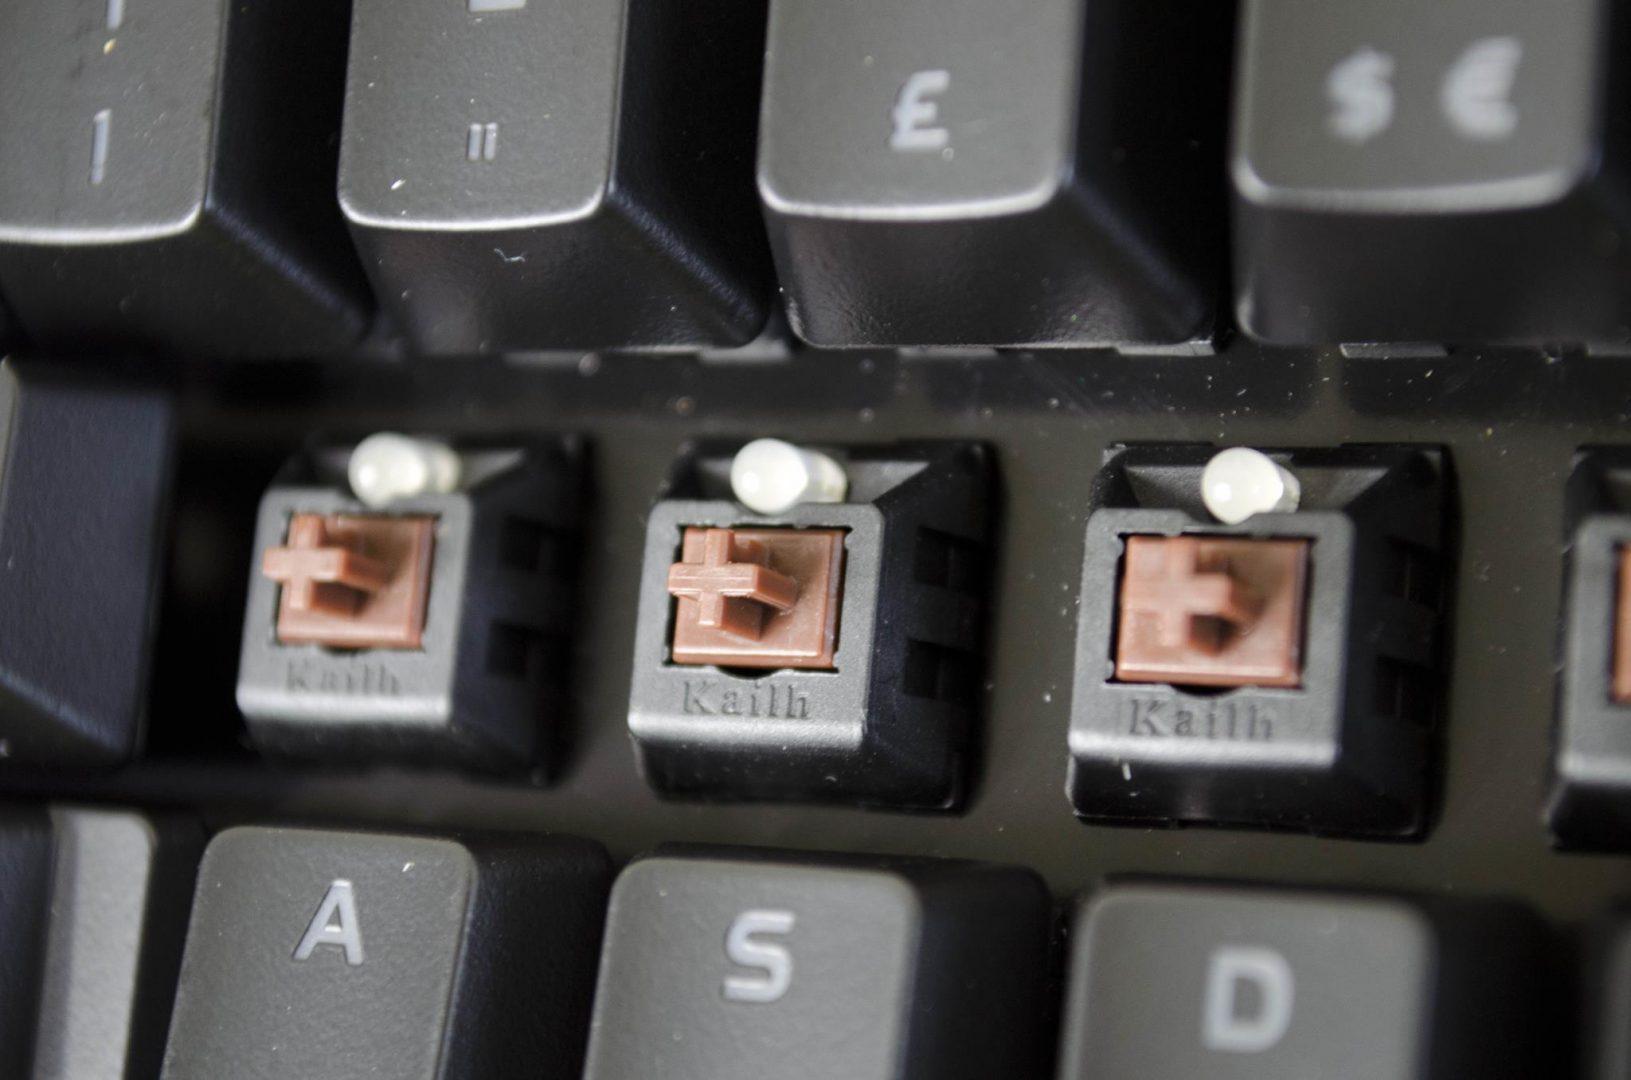 Tt eSPORTS POSEIDON Z Mechanical keyboard with brown switches_11